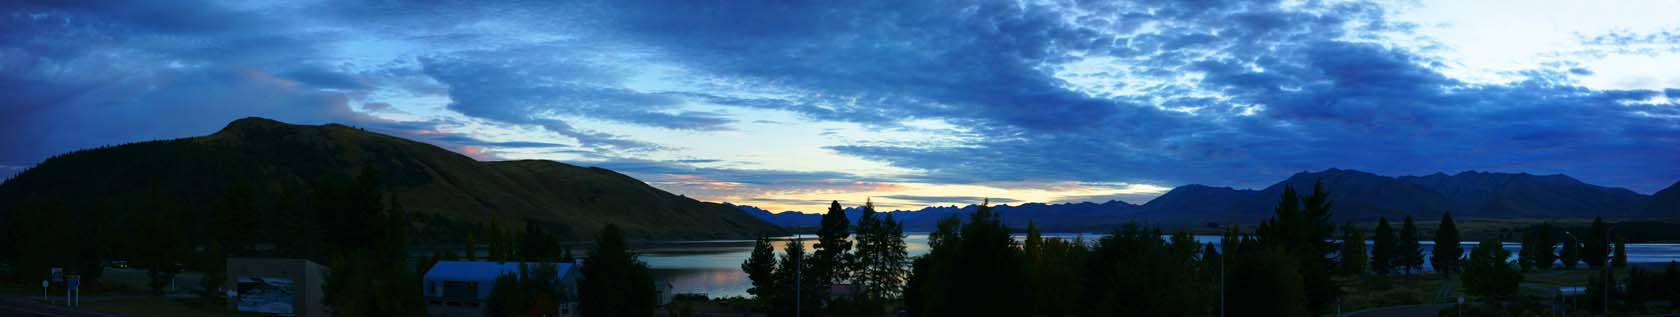 photo,material,free,landscape,picture,stock photo,Creative Commons,Tekapo of dusk, , , ,